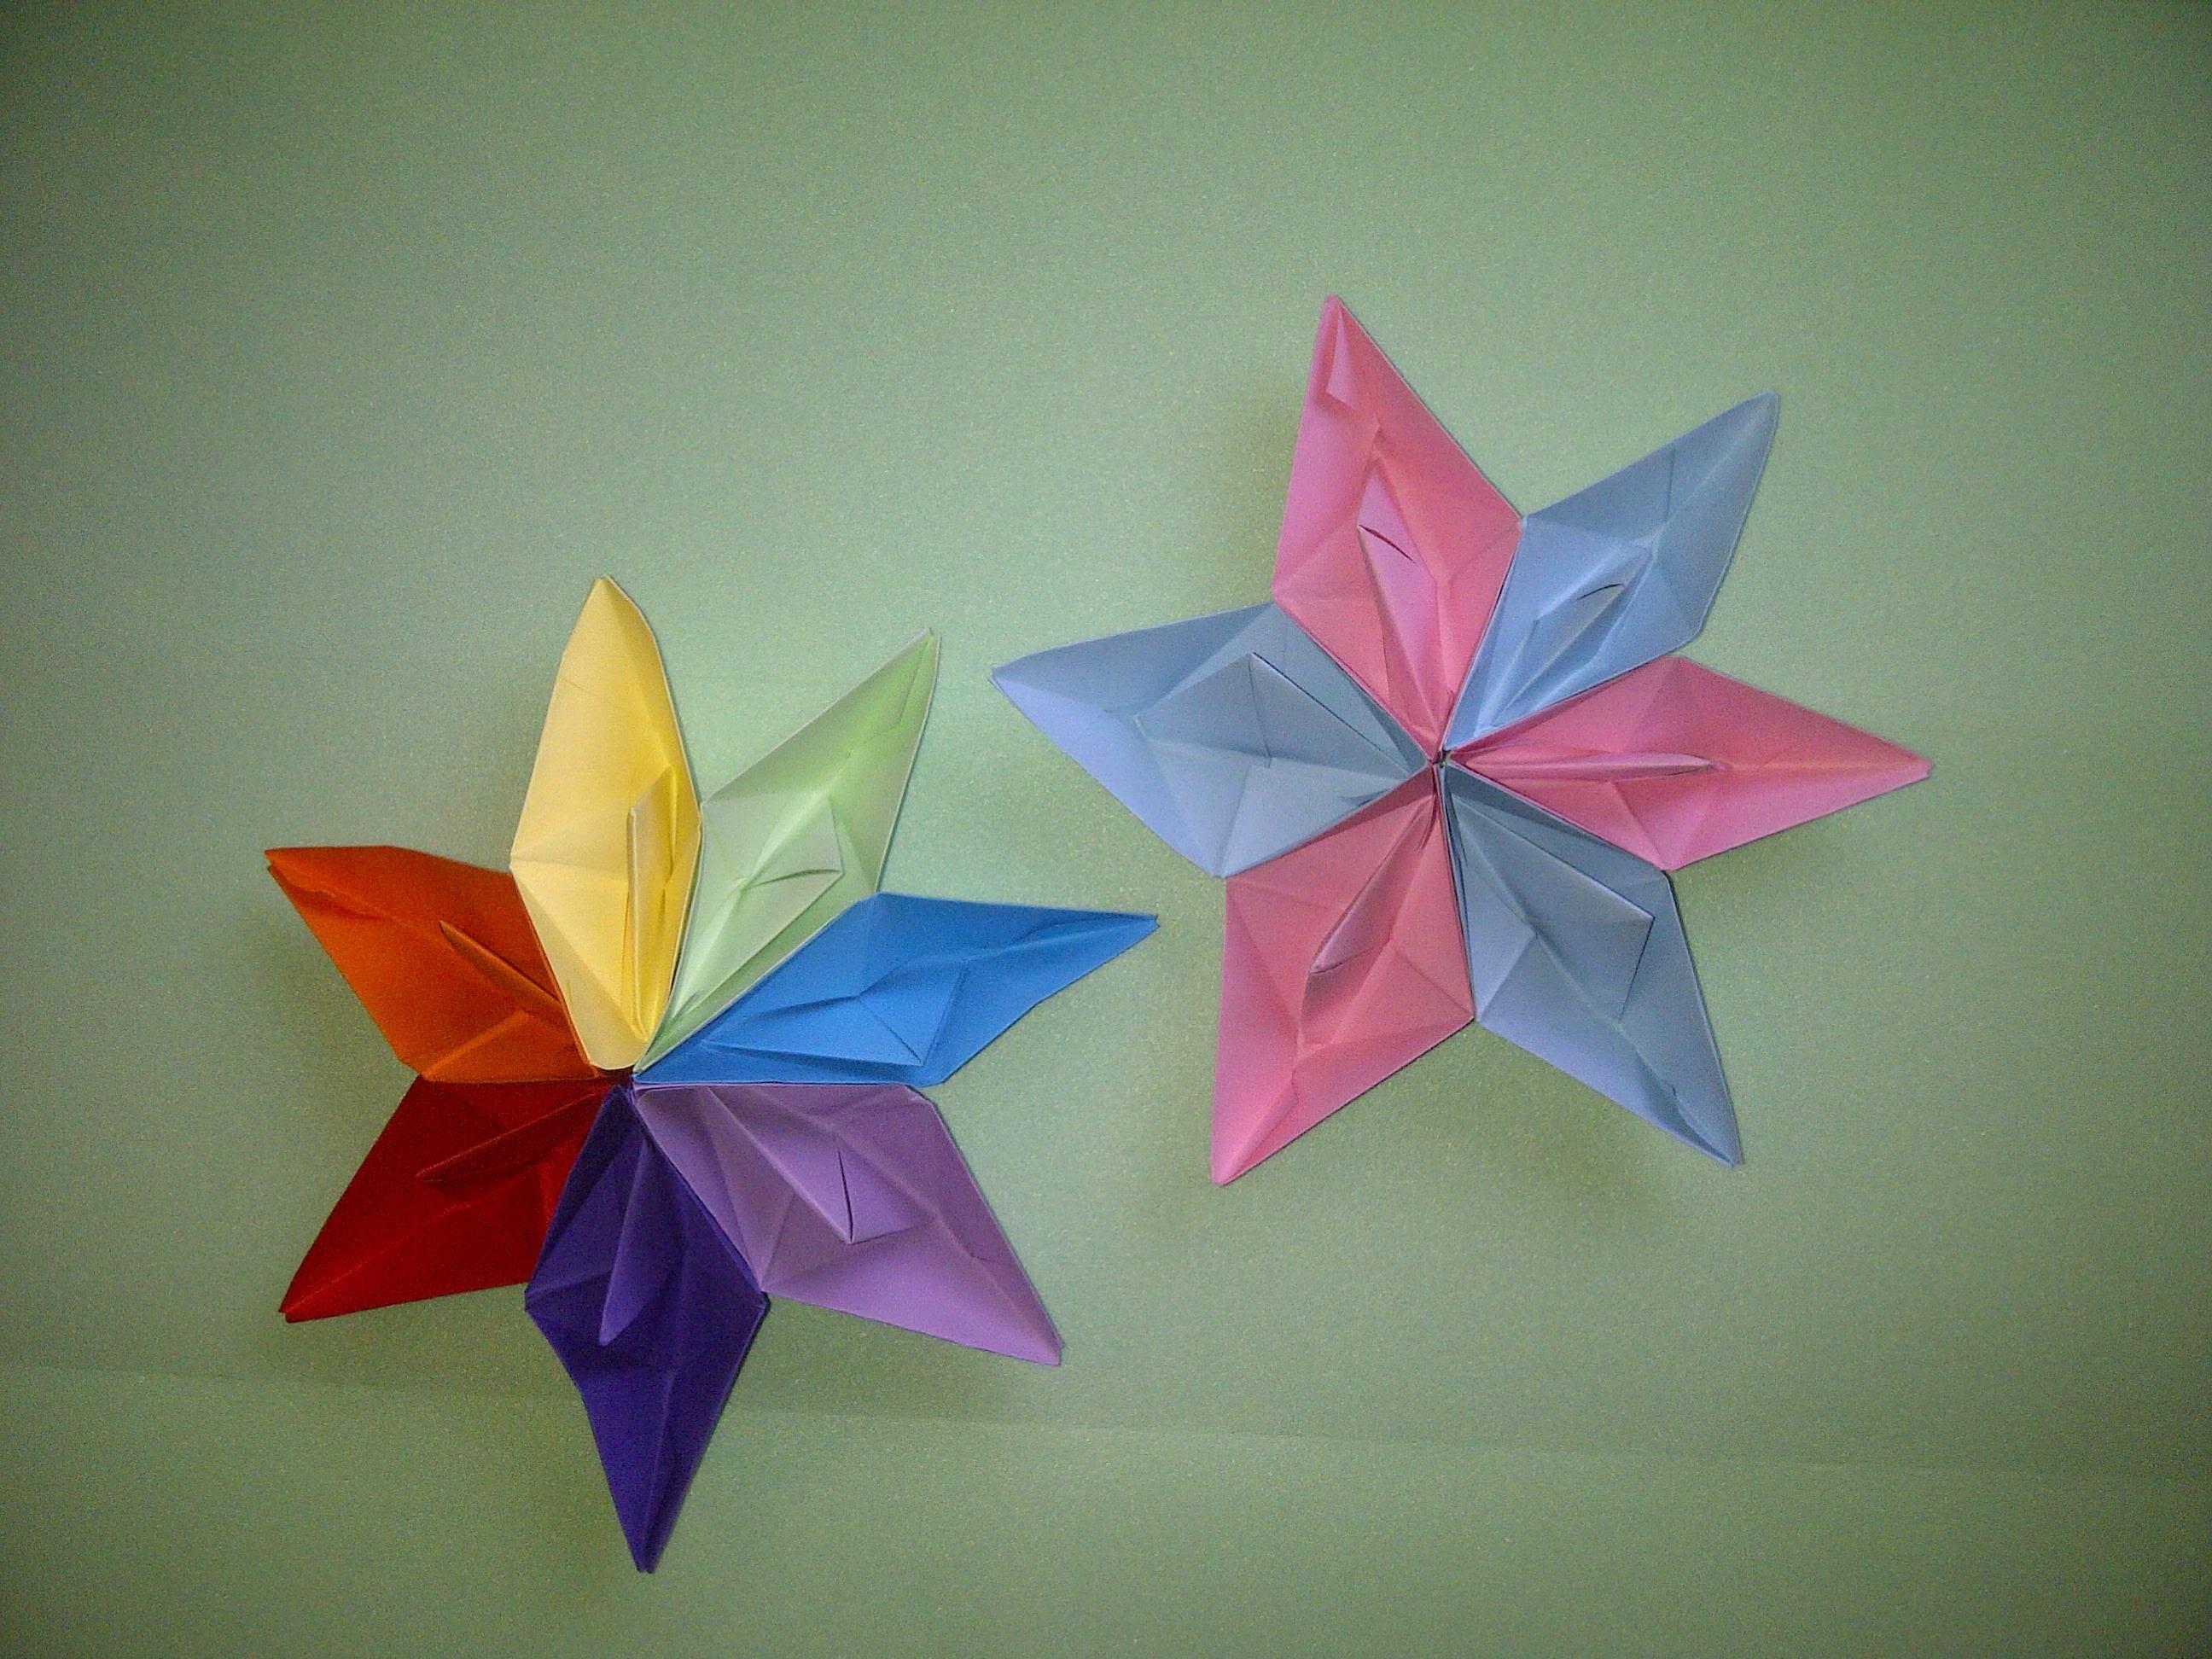 3D Sterne basteln - Weihnachtssterne falten. How To Make A 3D Paper Star